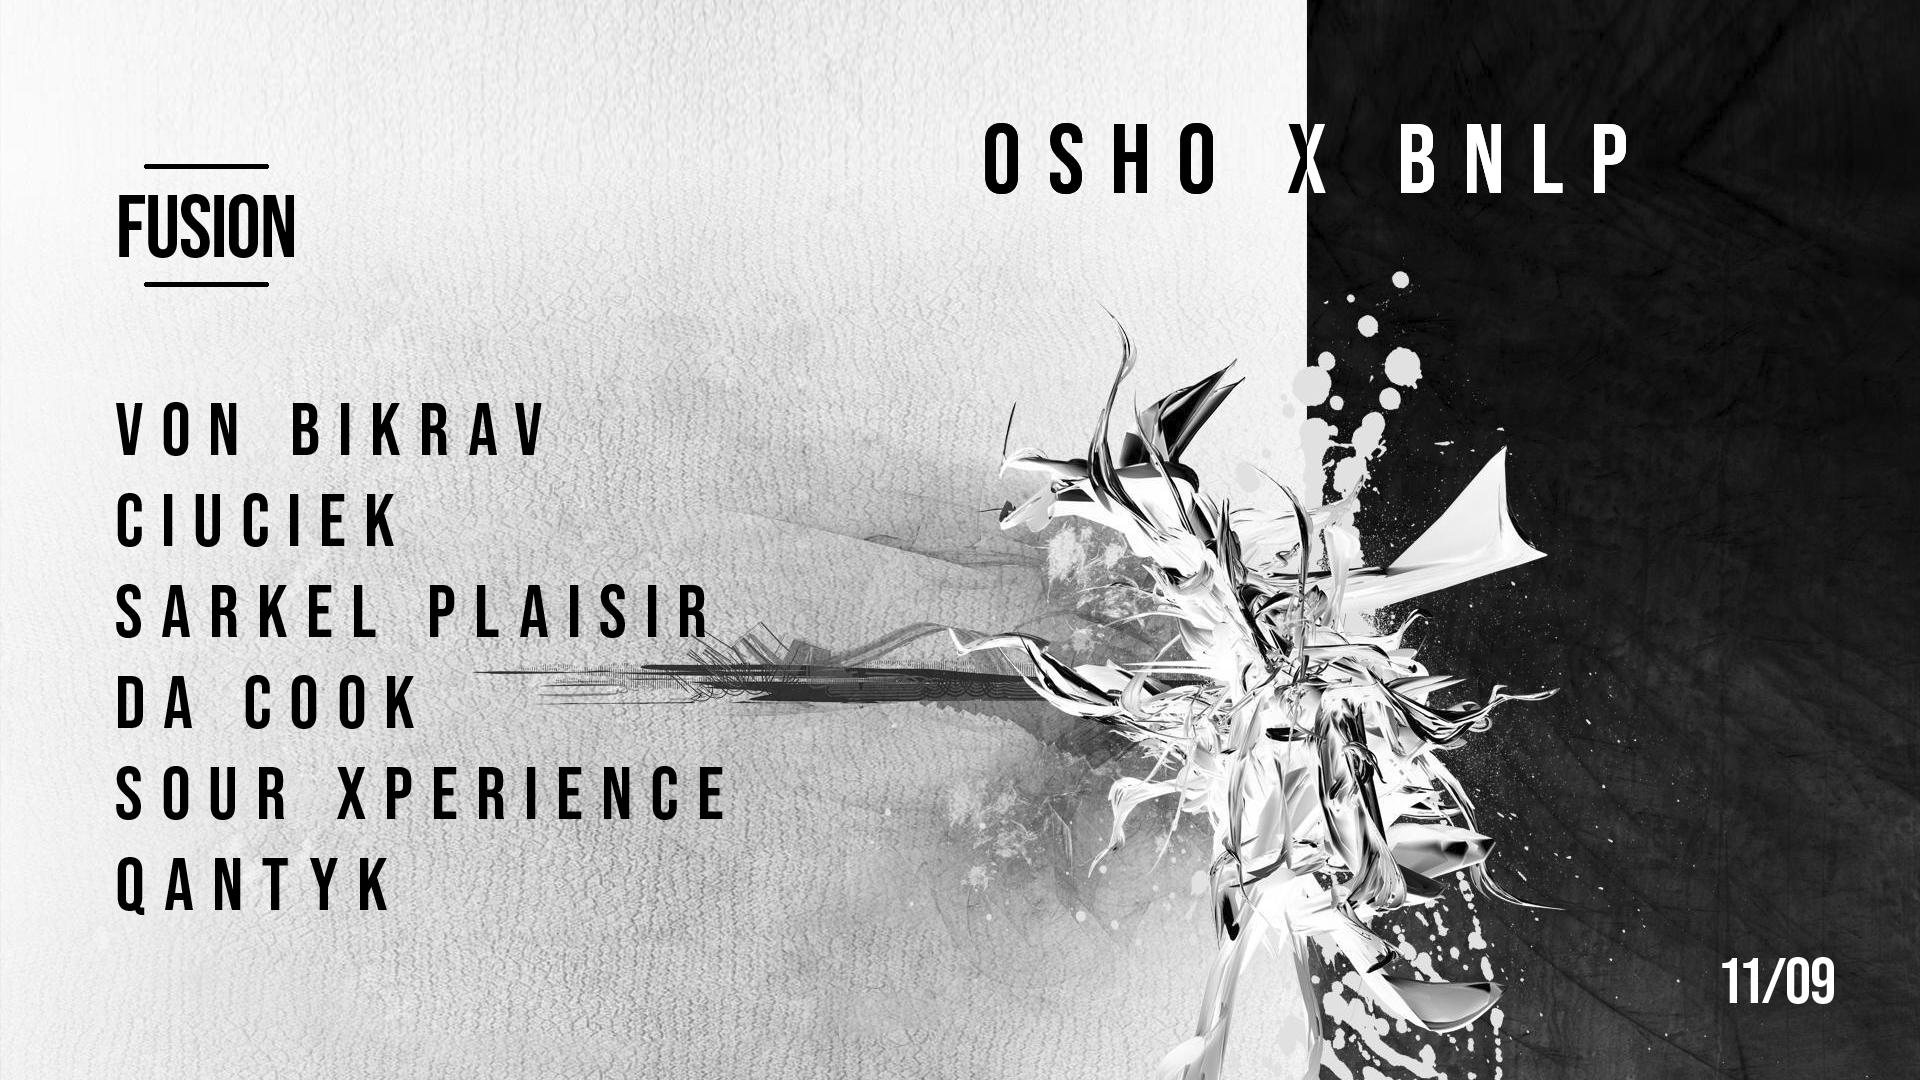 OSHO x BNLP - Fusion